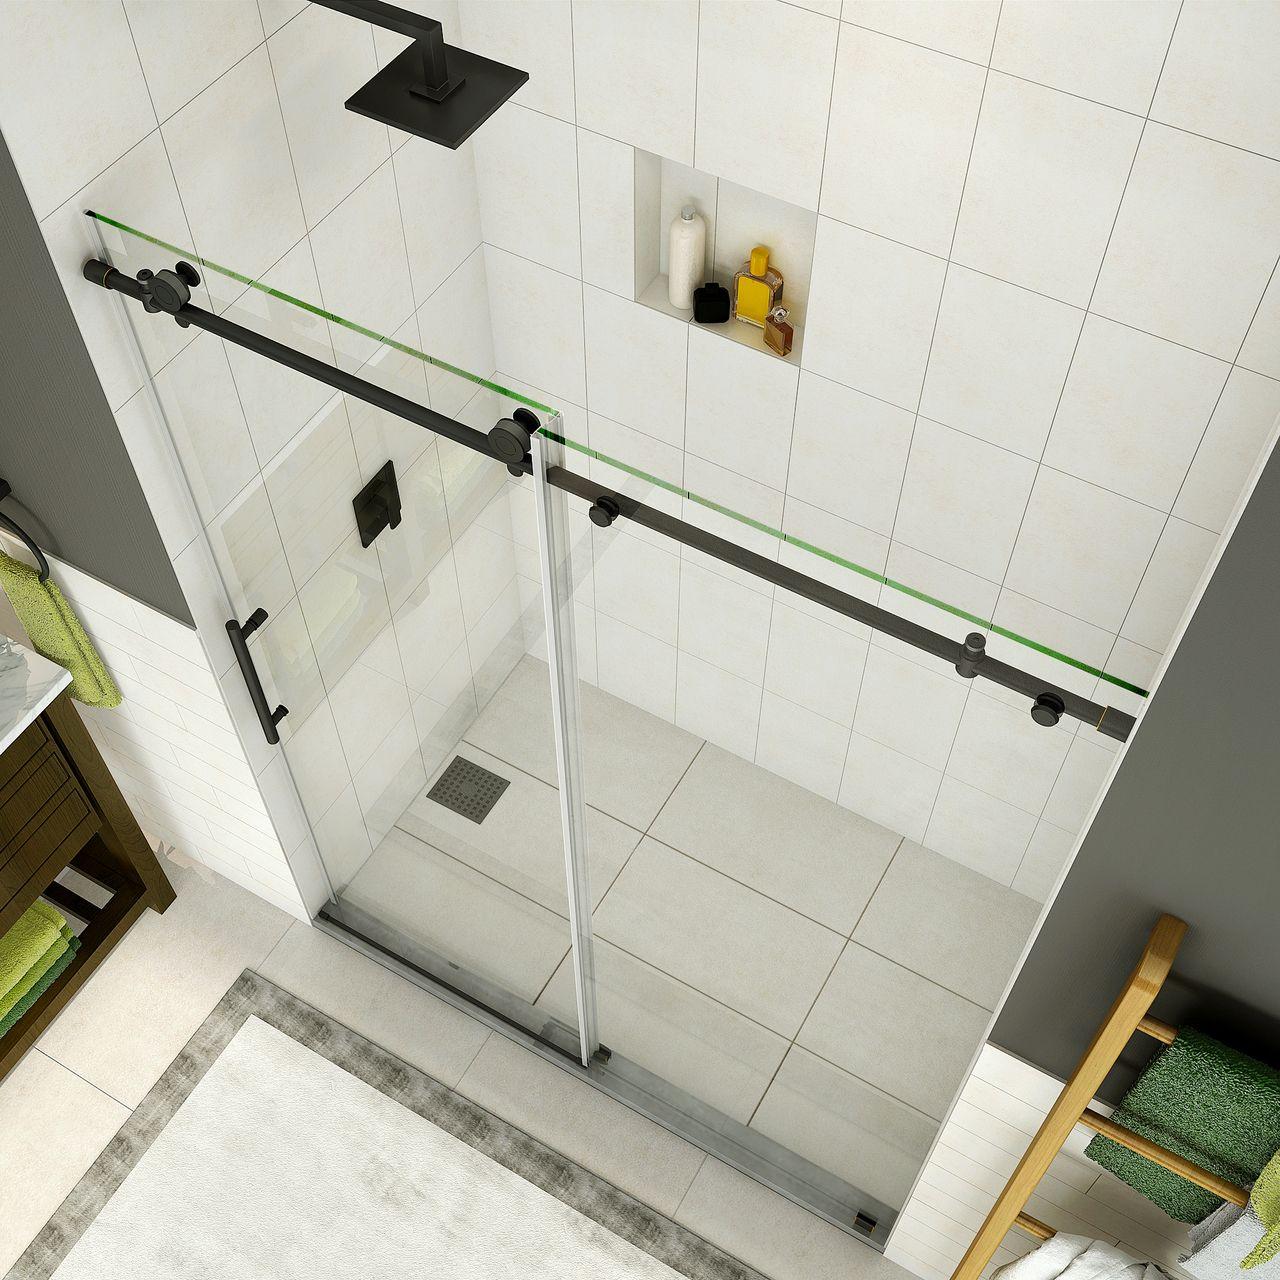 Sdr984 Coraline Coraline Xl Frameless Sliding Alcove Shower Door With Starcast Coating Tub Doors Shower Doors Frameless Sliding Shower Doors